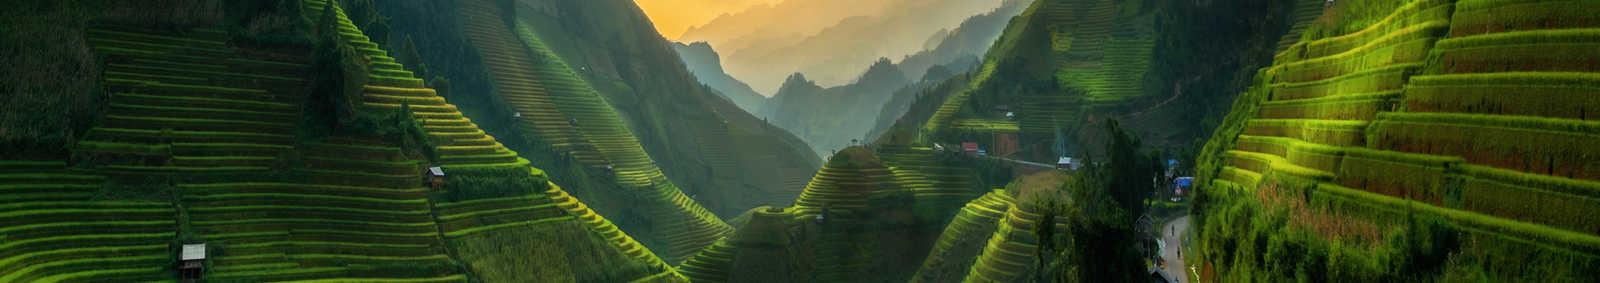 vietnam fields